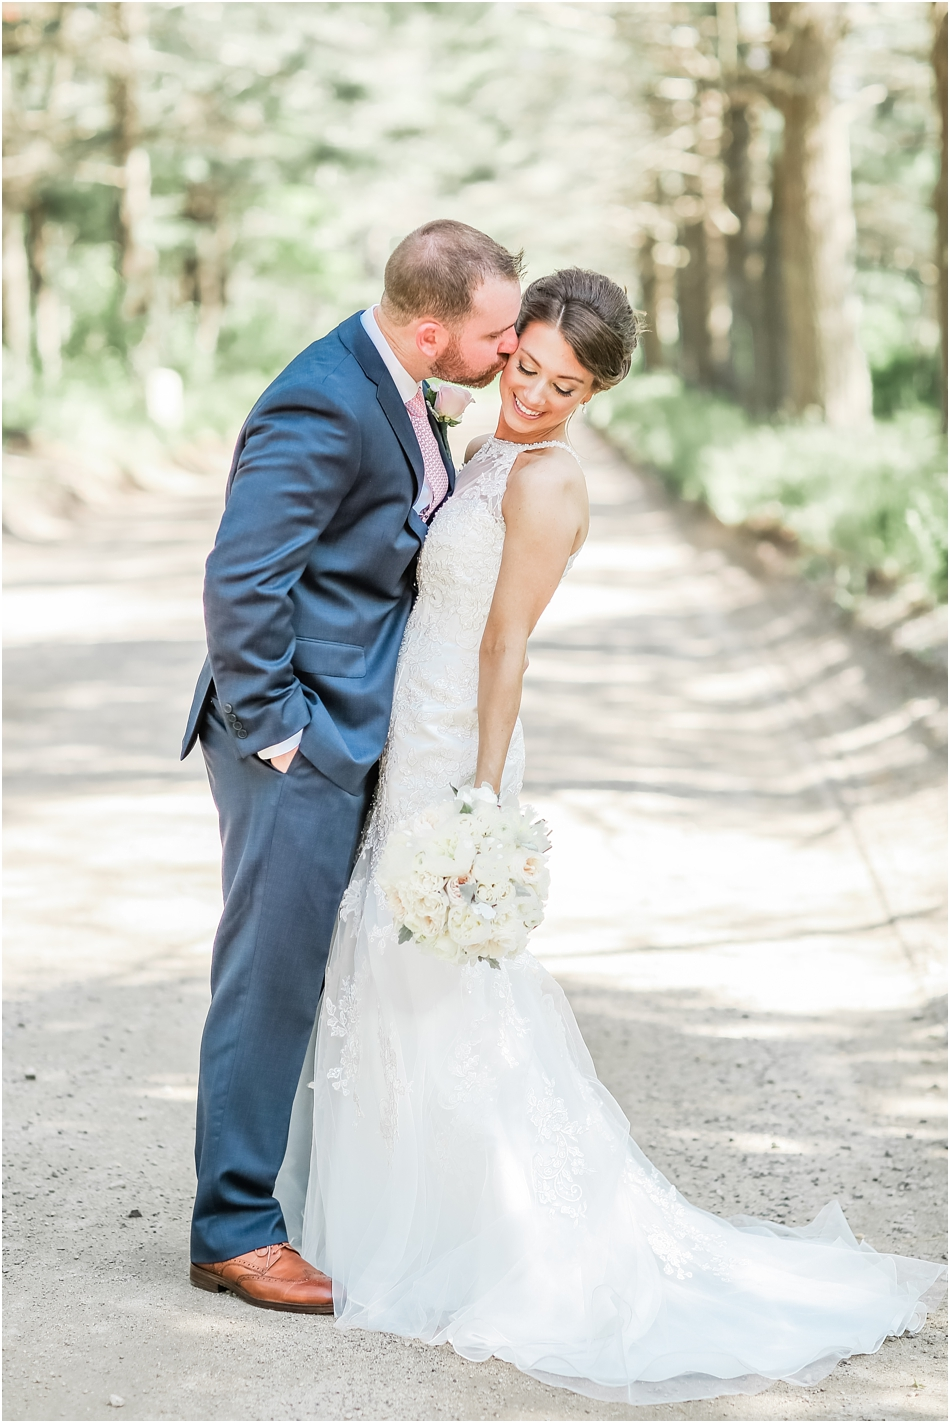 pine_hills_mirbeau_golf_club_boston_massachusetts_cape_cod_new_england_wedding_photographer_Meredith_Jane_Photography_photo_1705.jpg